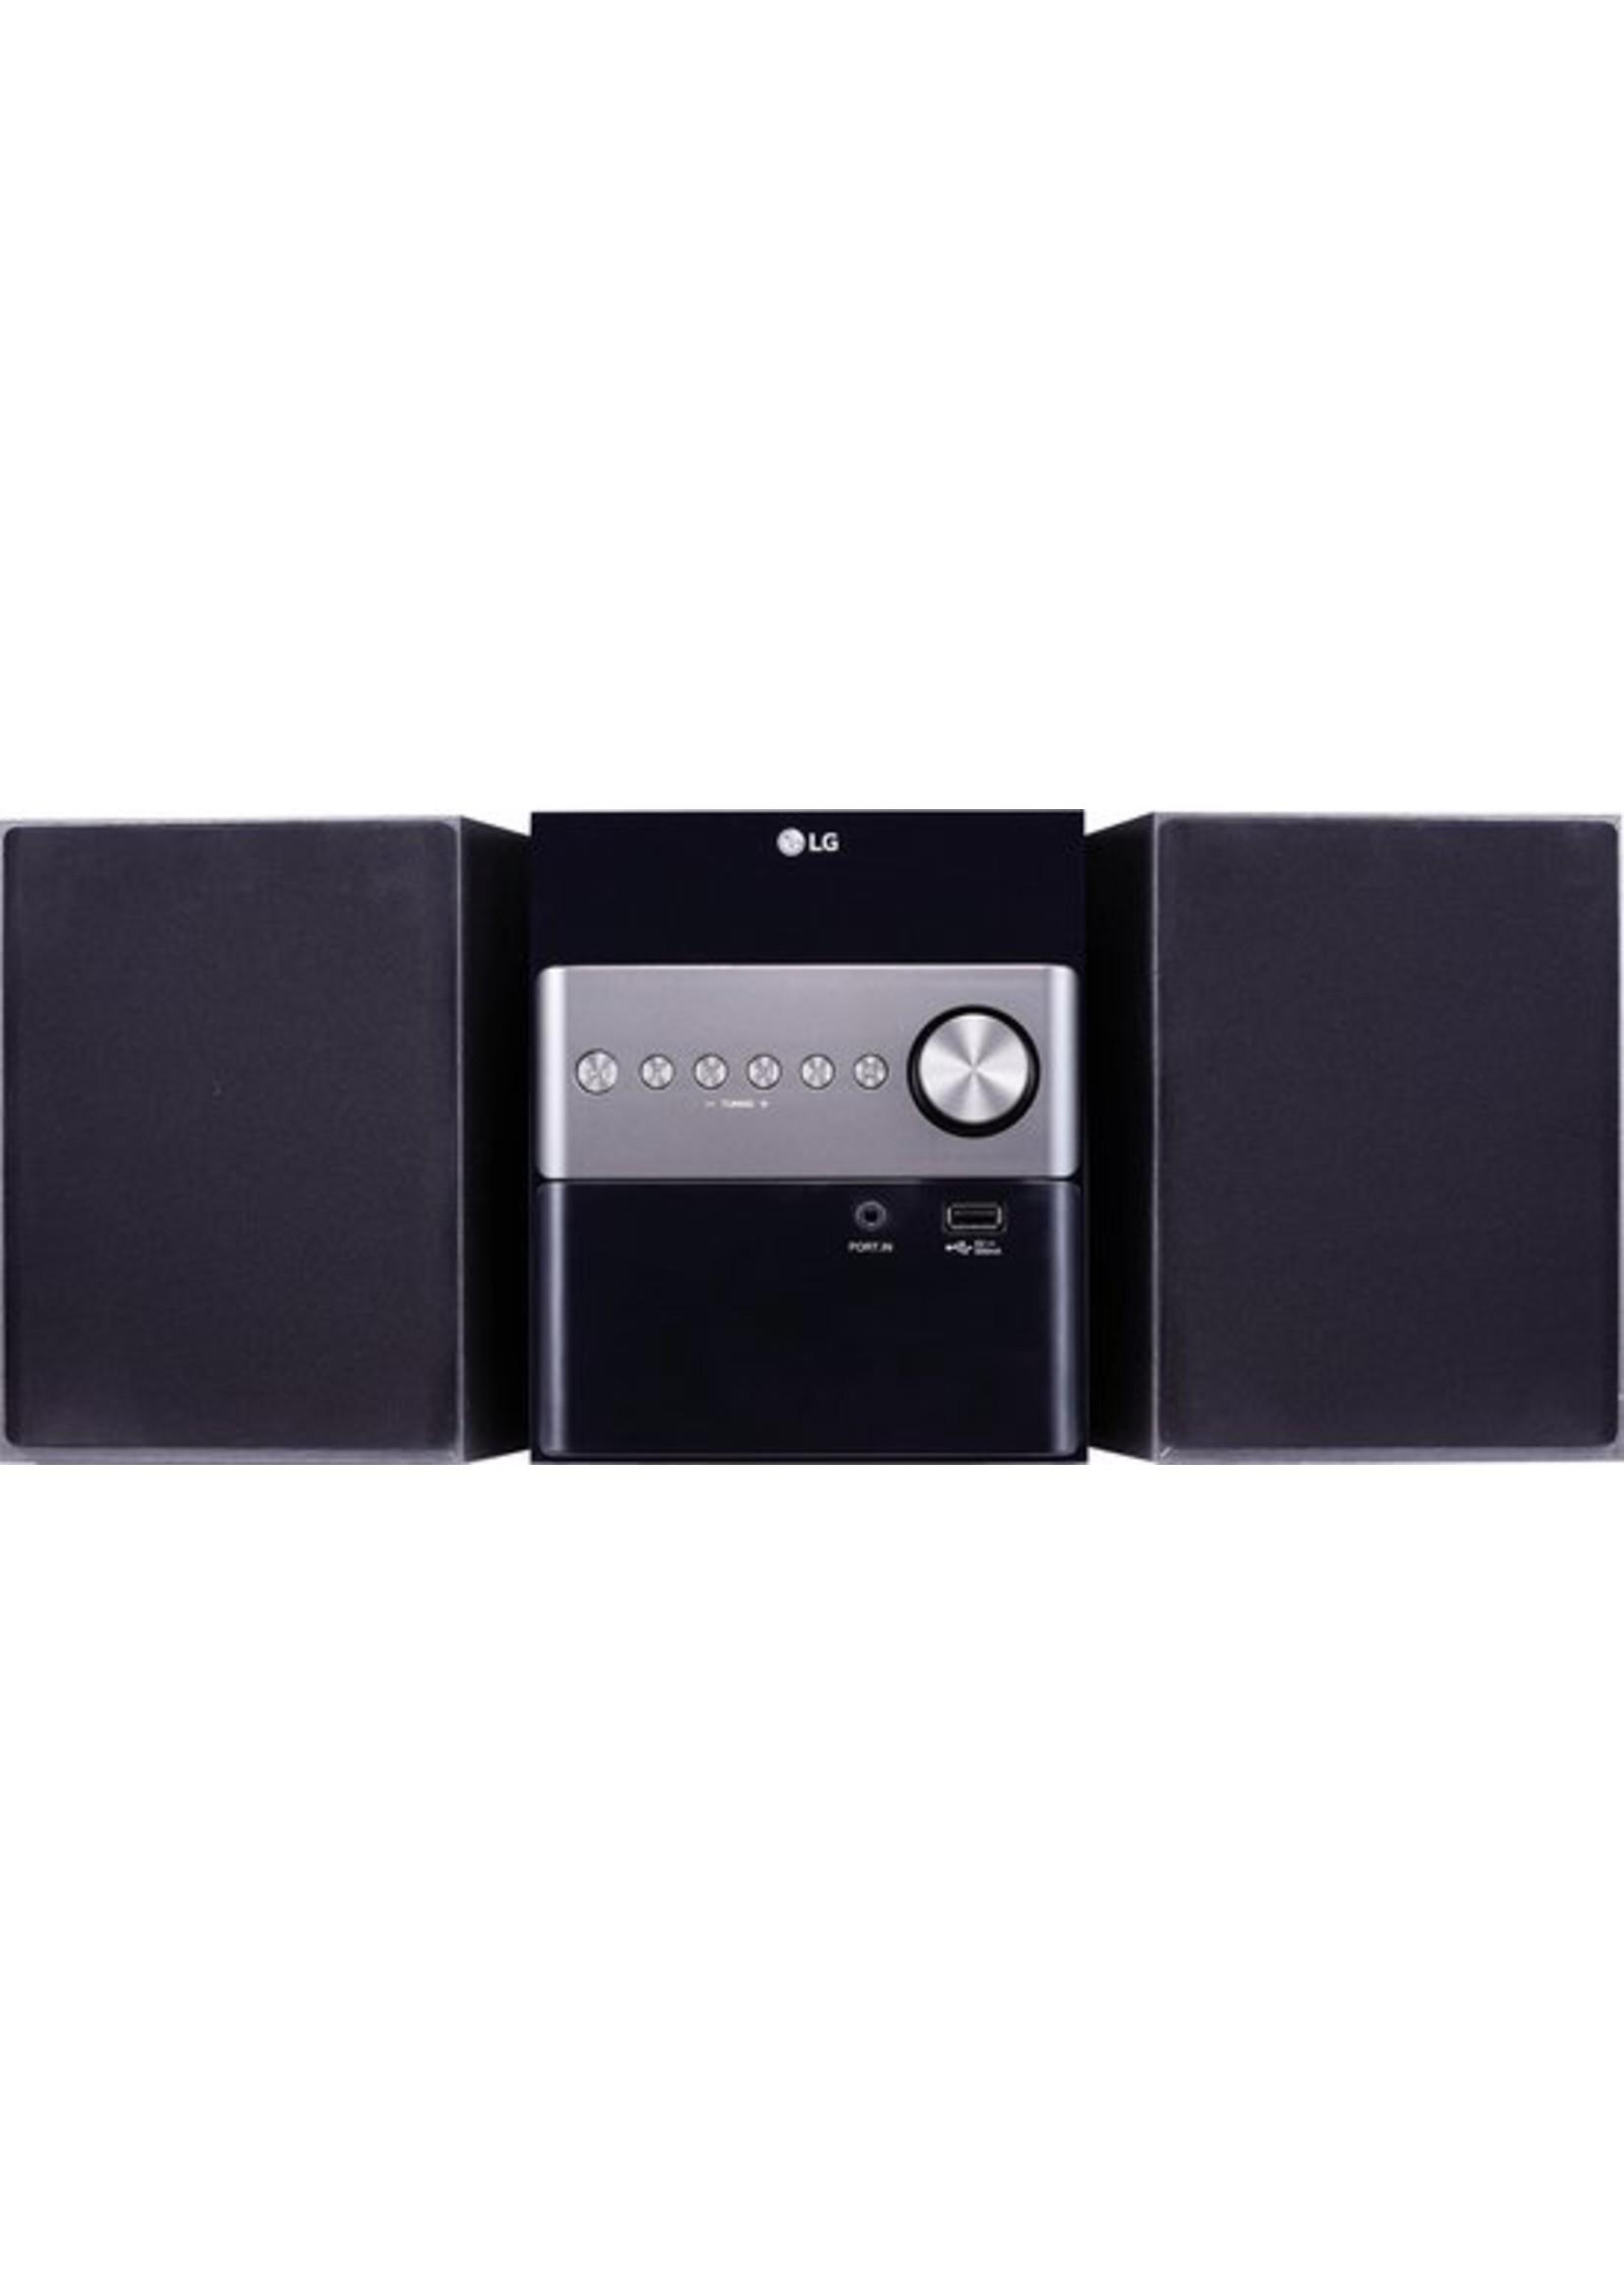 LG LG XBoom Micro Hi-Fi Home audio-microsysteem Zwart 10 W